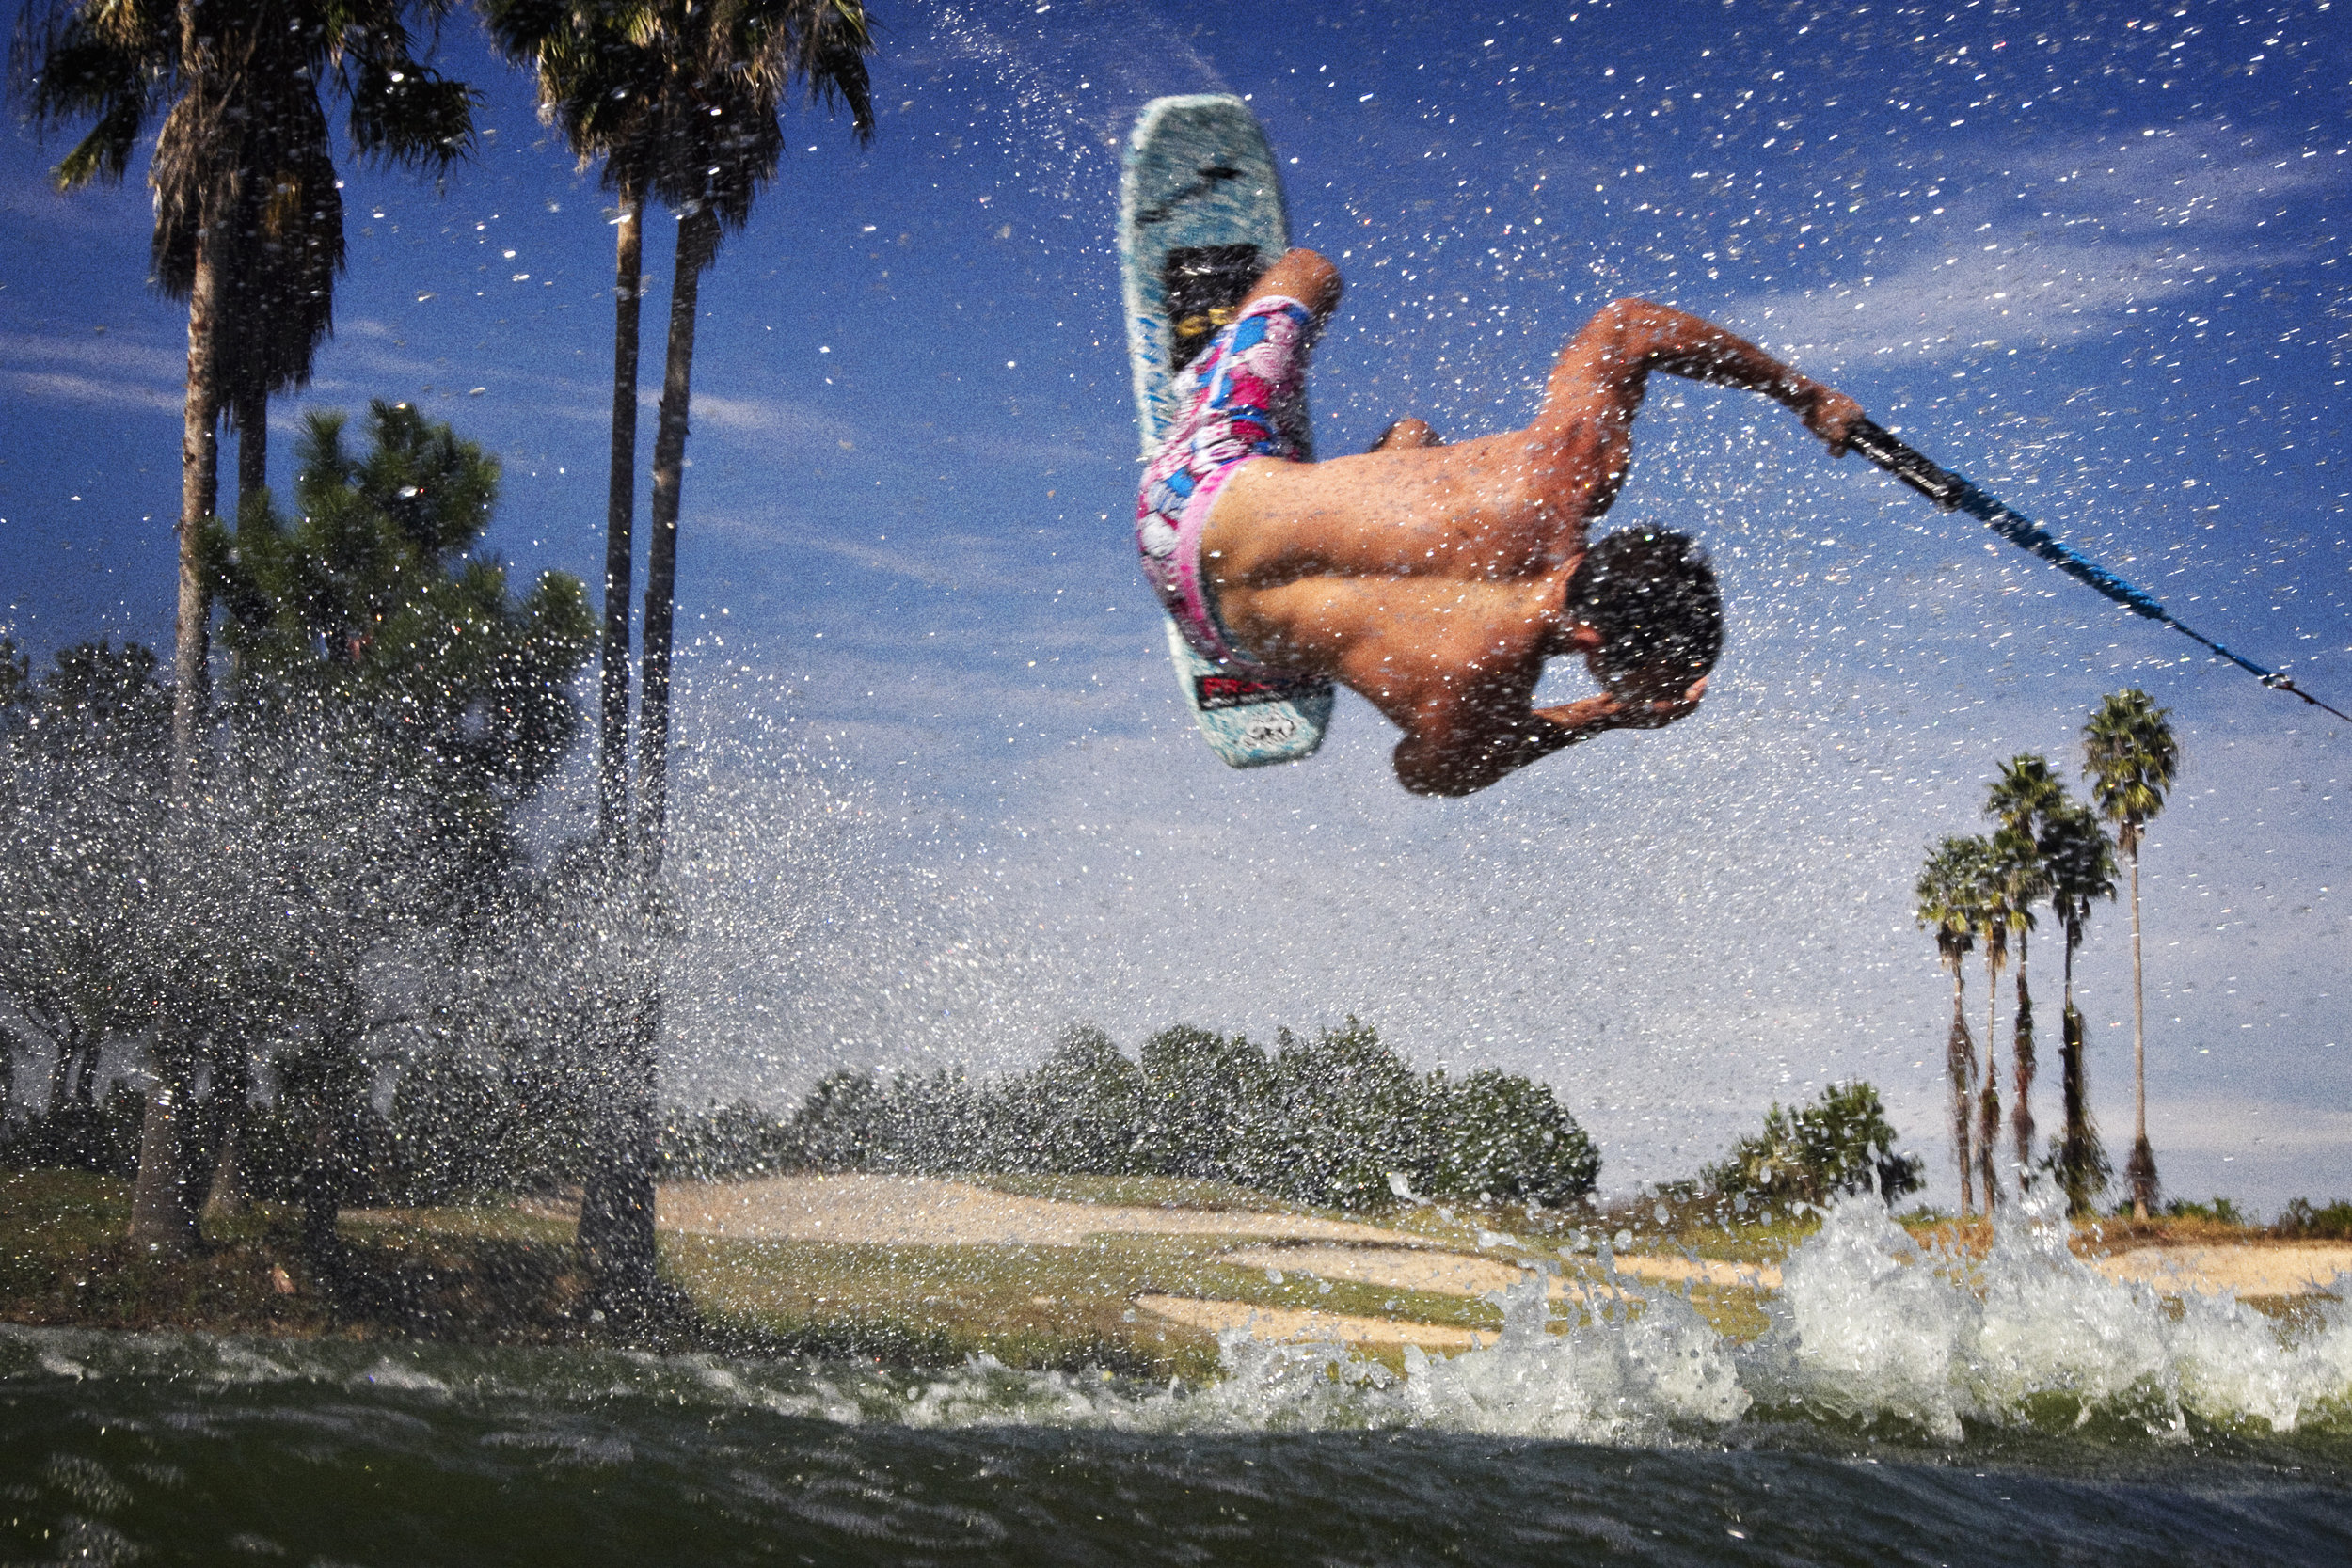 World-champion waterskier Thibault Dailland executing an ollie over my head.